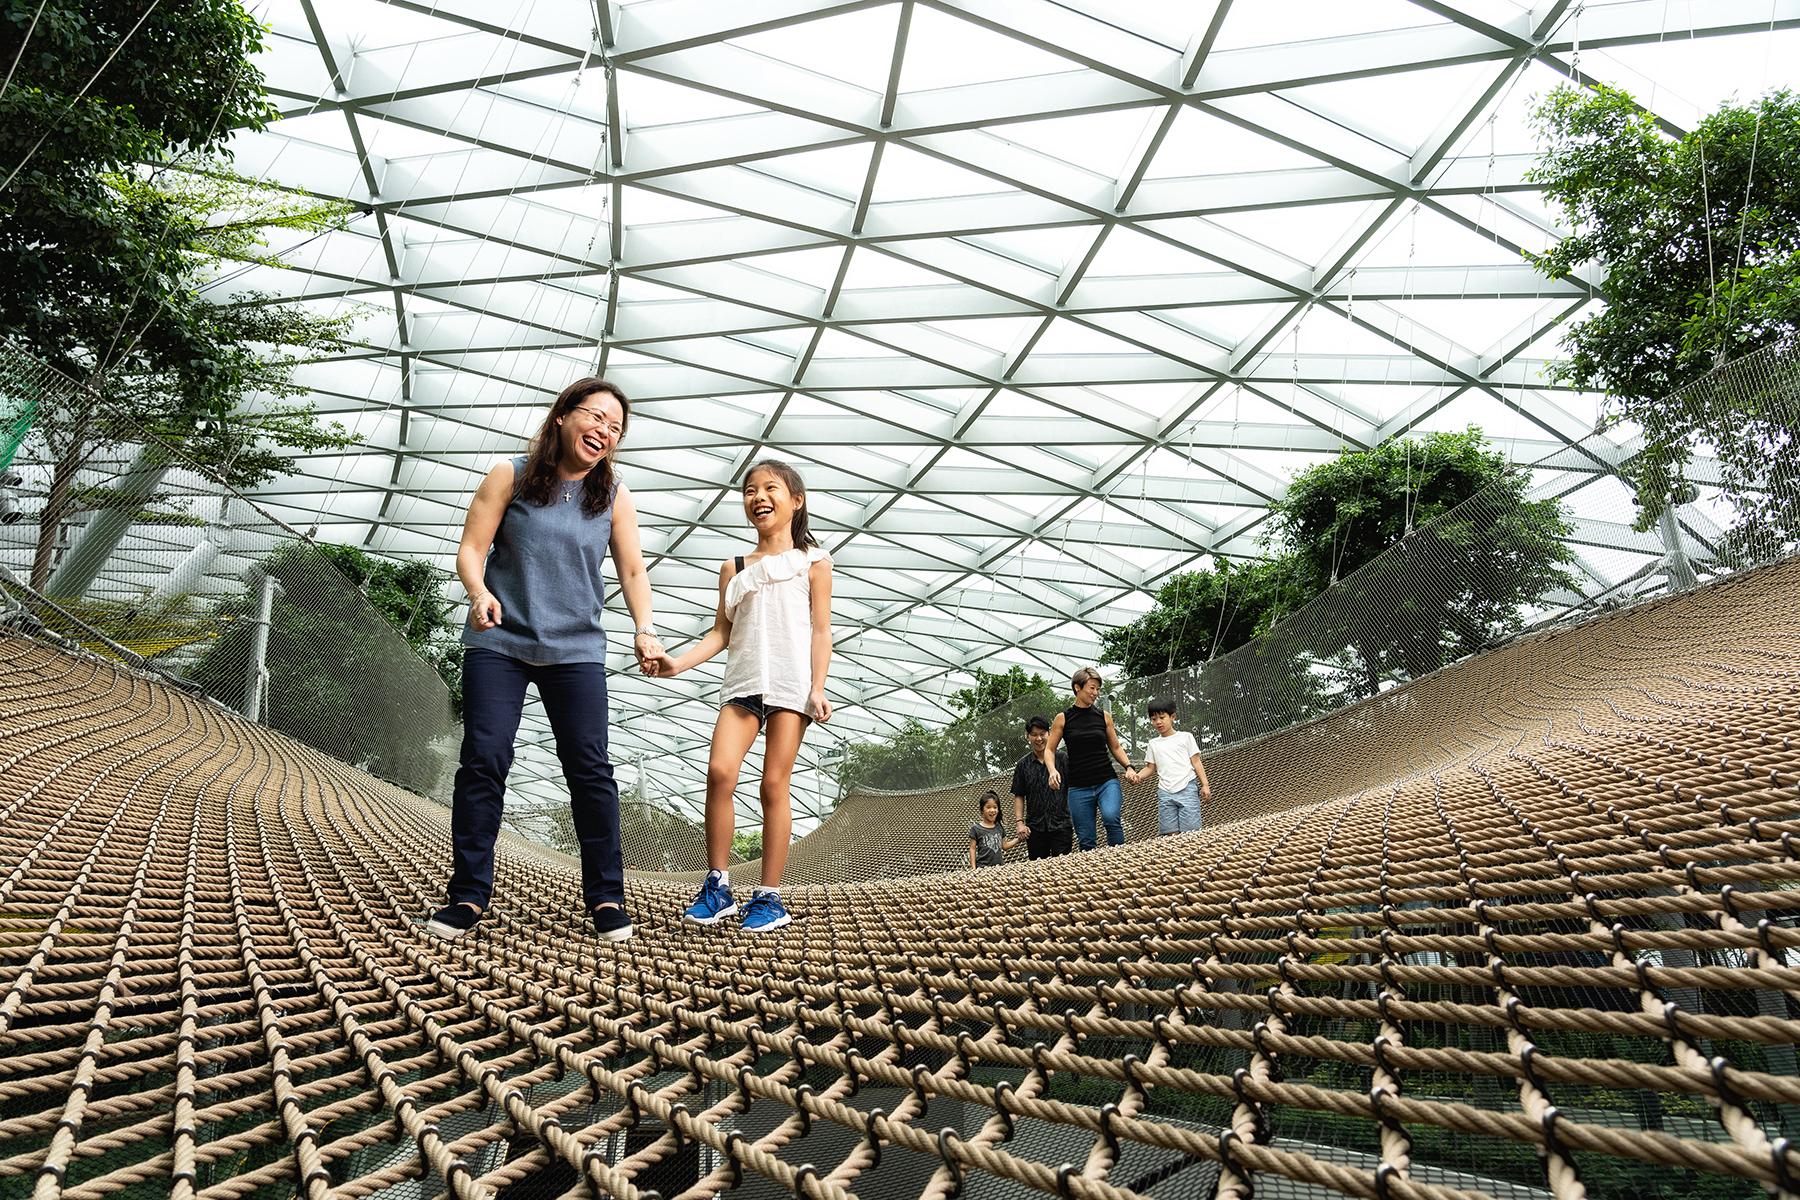 singapore-photographer-manulife-jewel-skynets-03.jpg